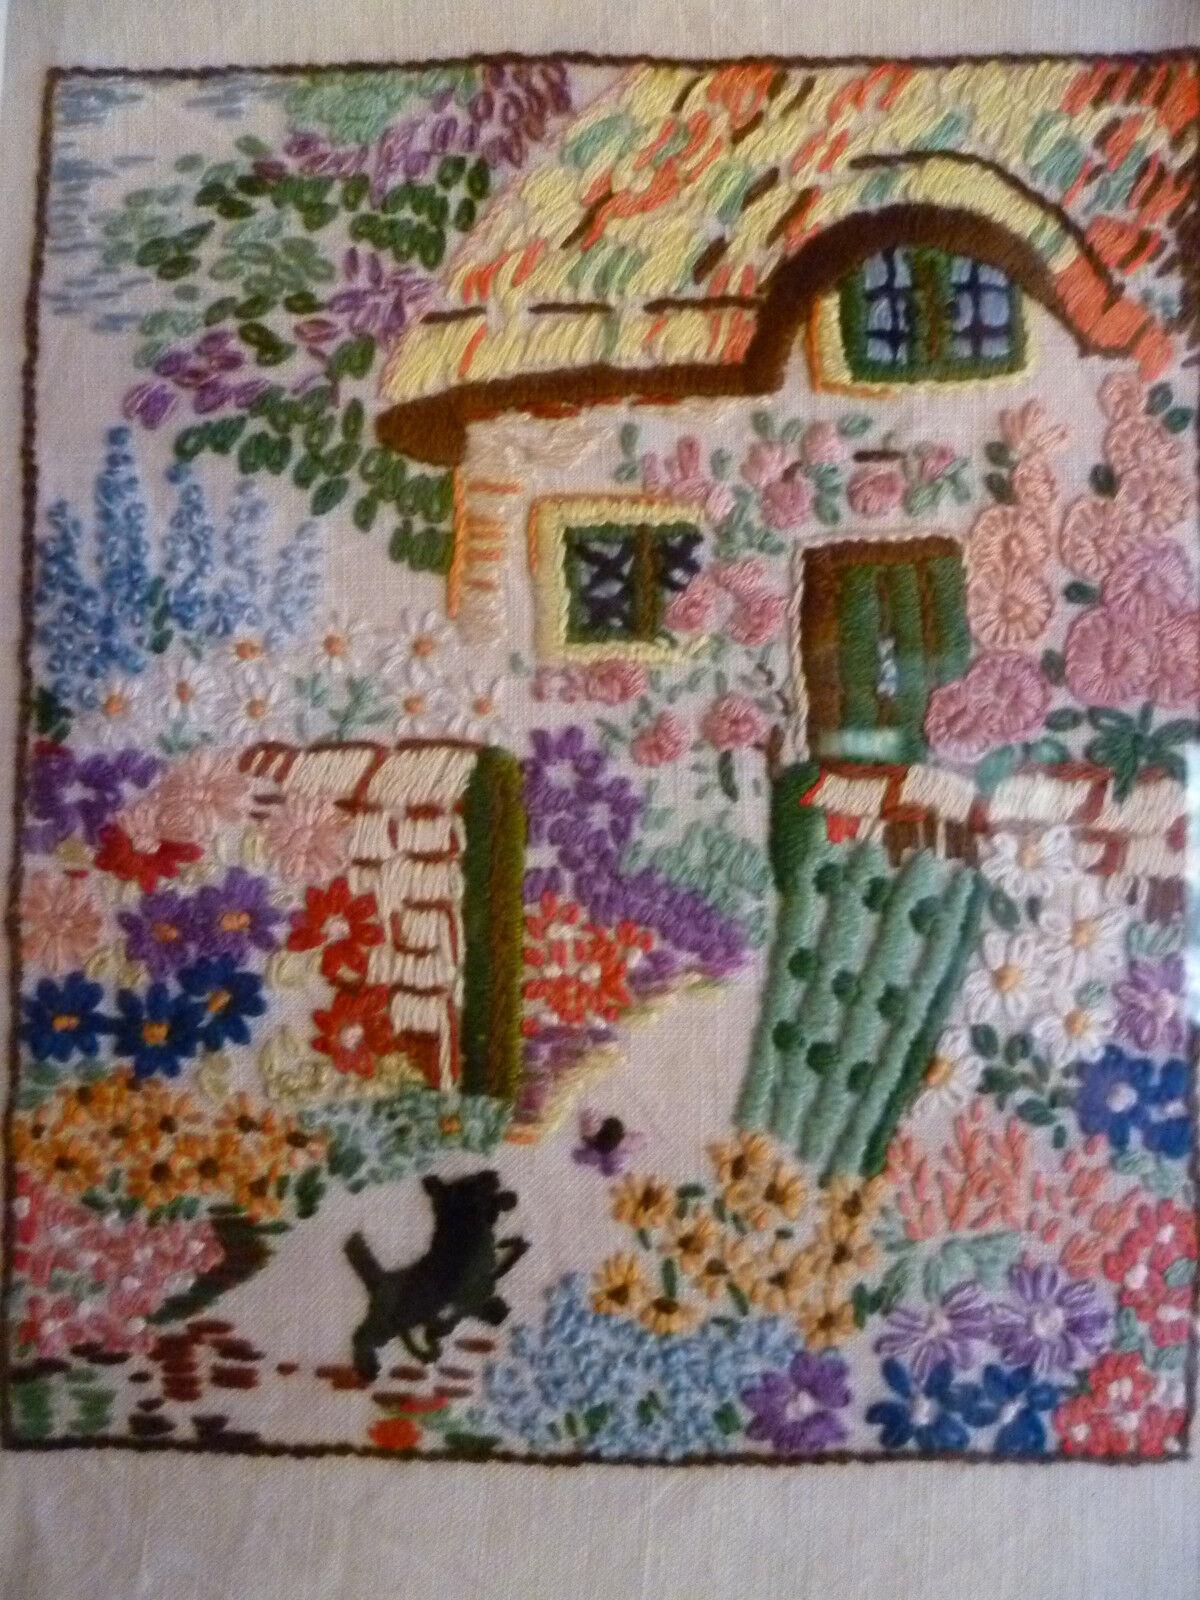 Janettes Vintage Linen andTreasures